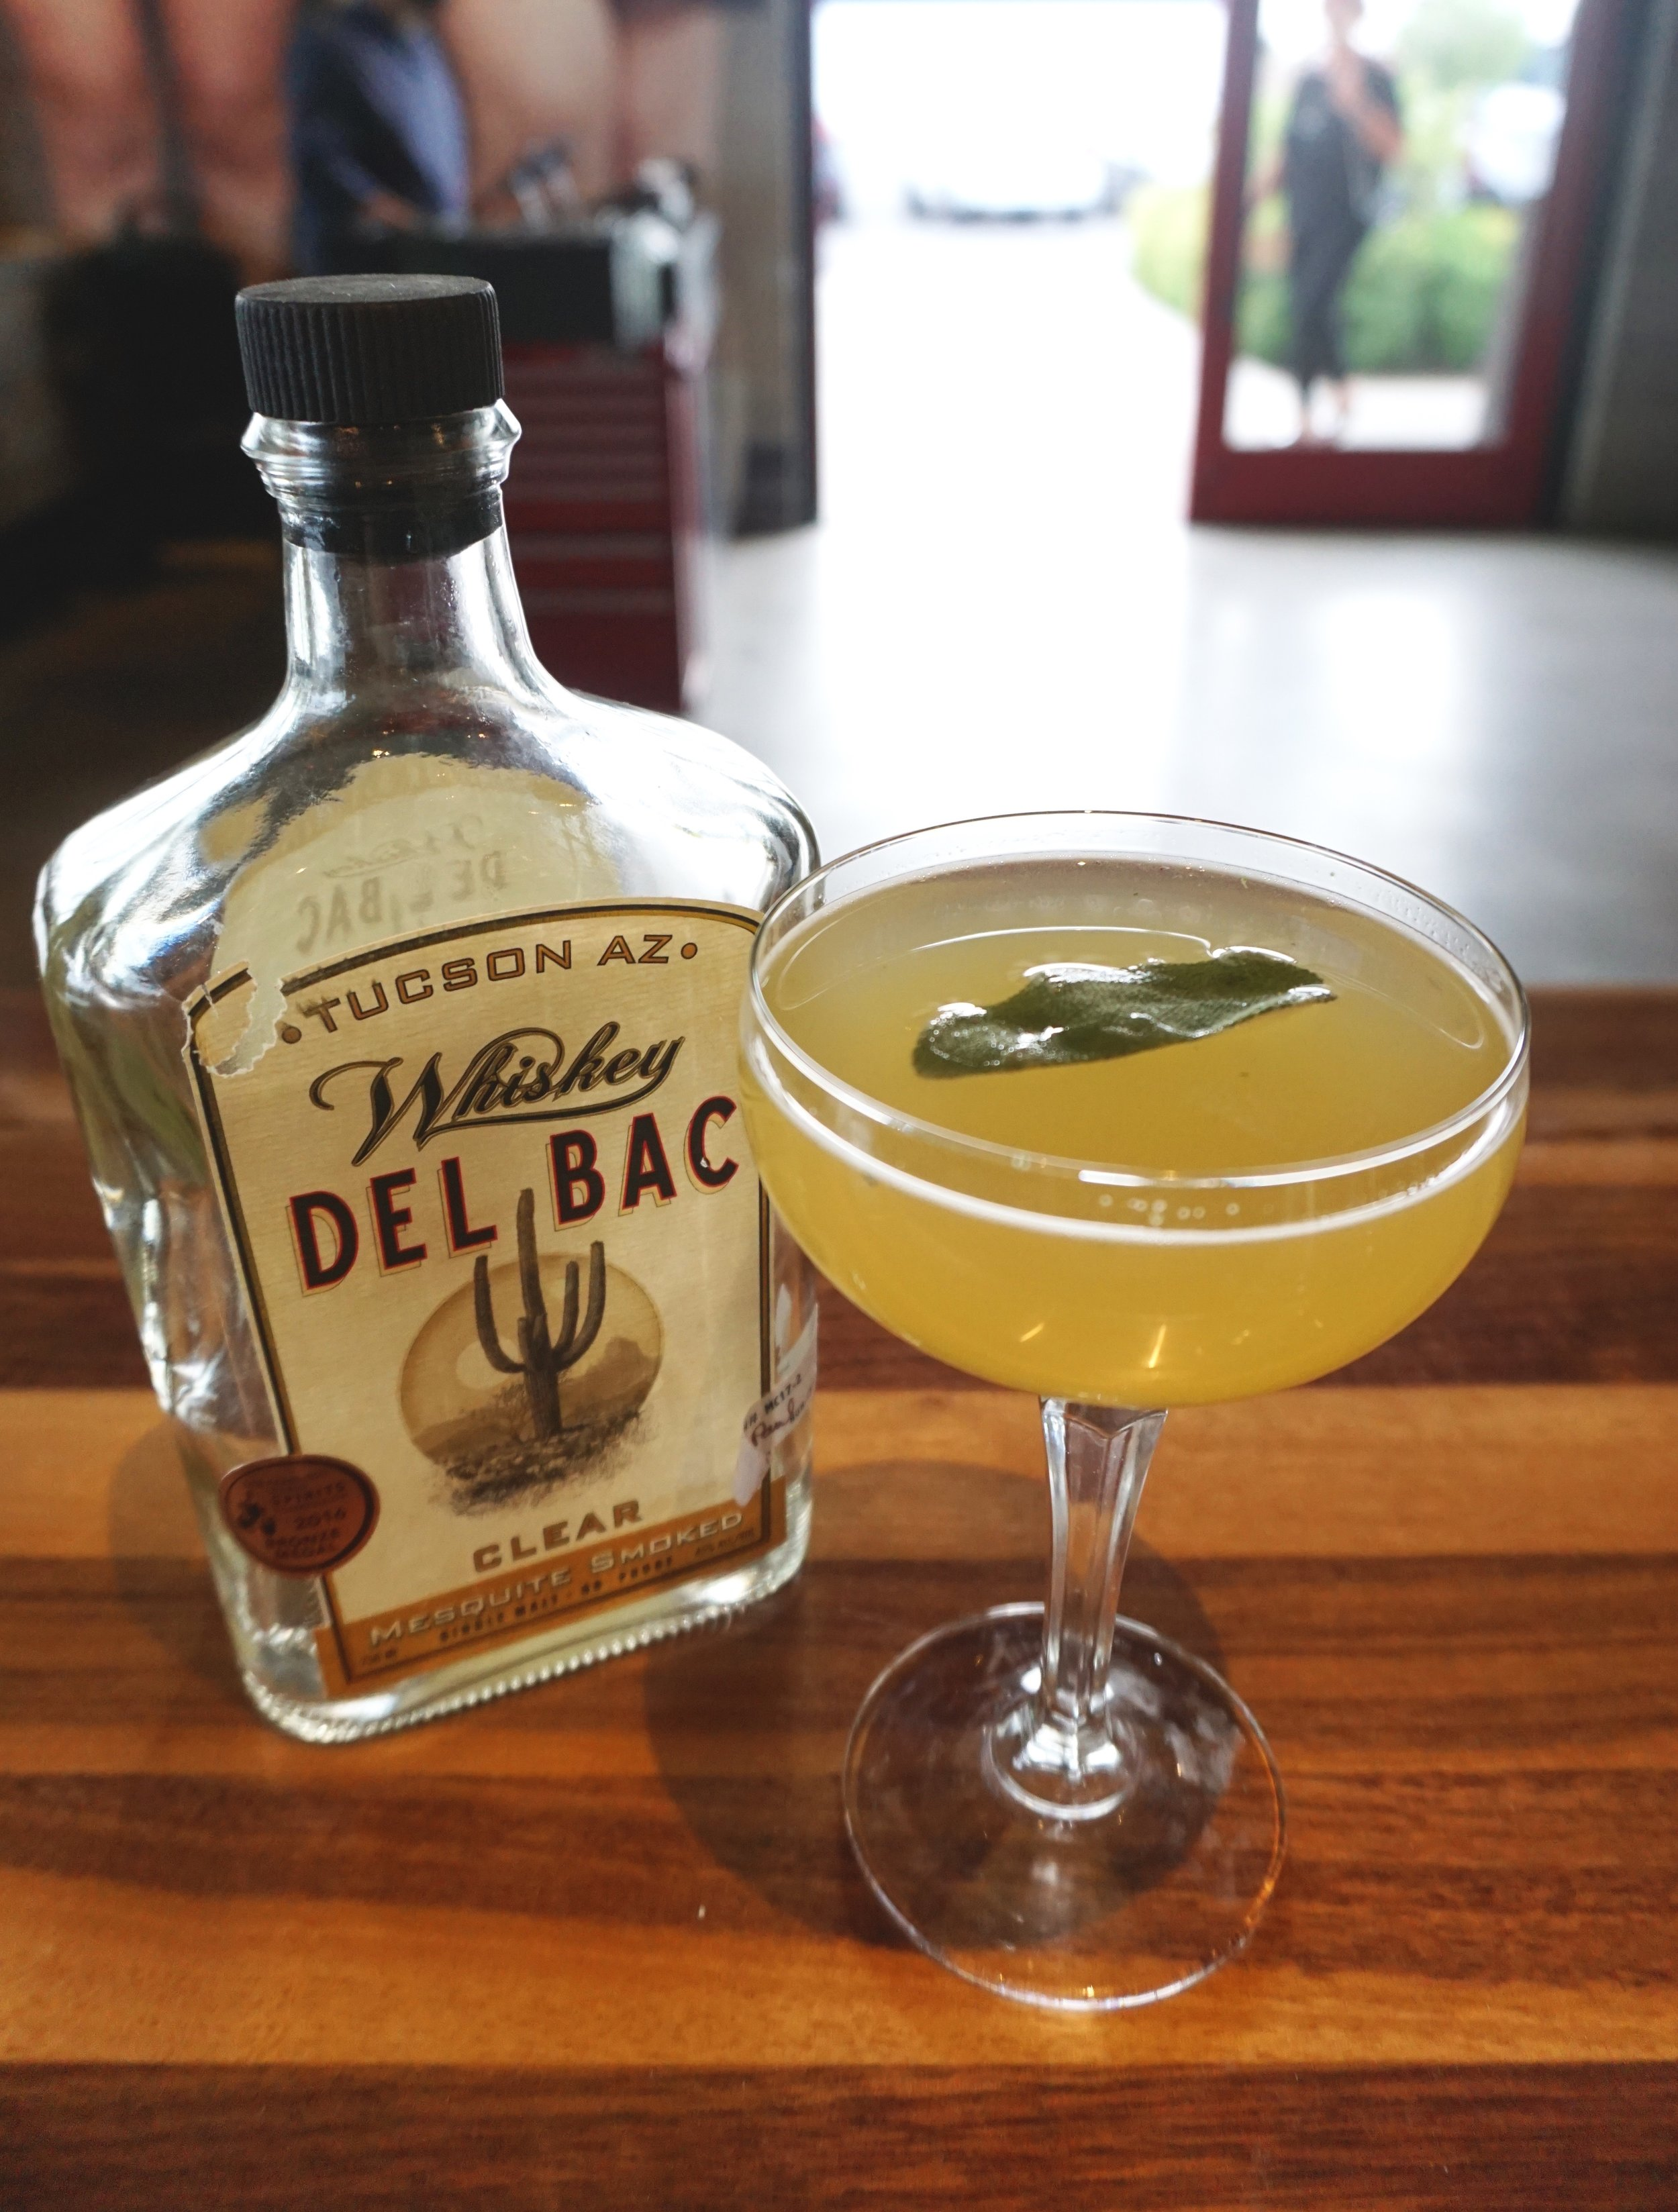 The Spirited    Sage - 1.5 Oz Whiskey Del Bac- Clear2 Muddled Sage Leaves.75 Oz Fresh Lemon Juice.5 Oz Honey Syrup.5 Oz Licor 43.25 Oz Green Chartreuse